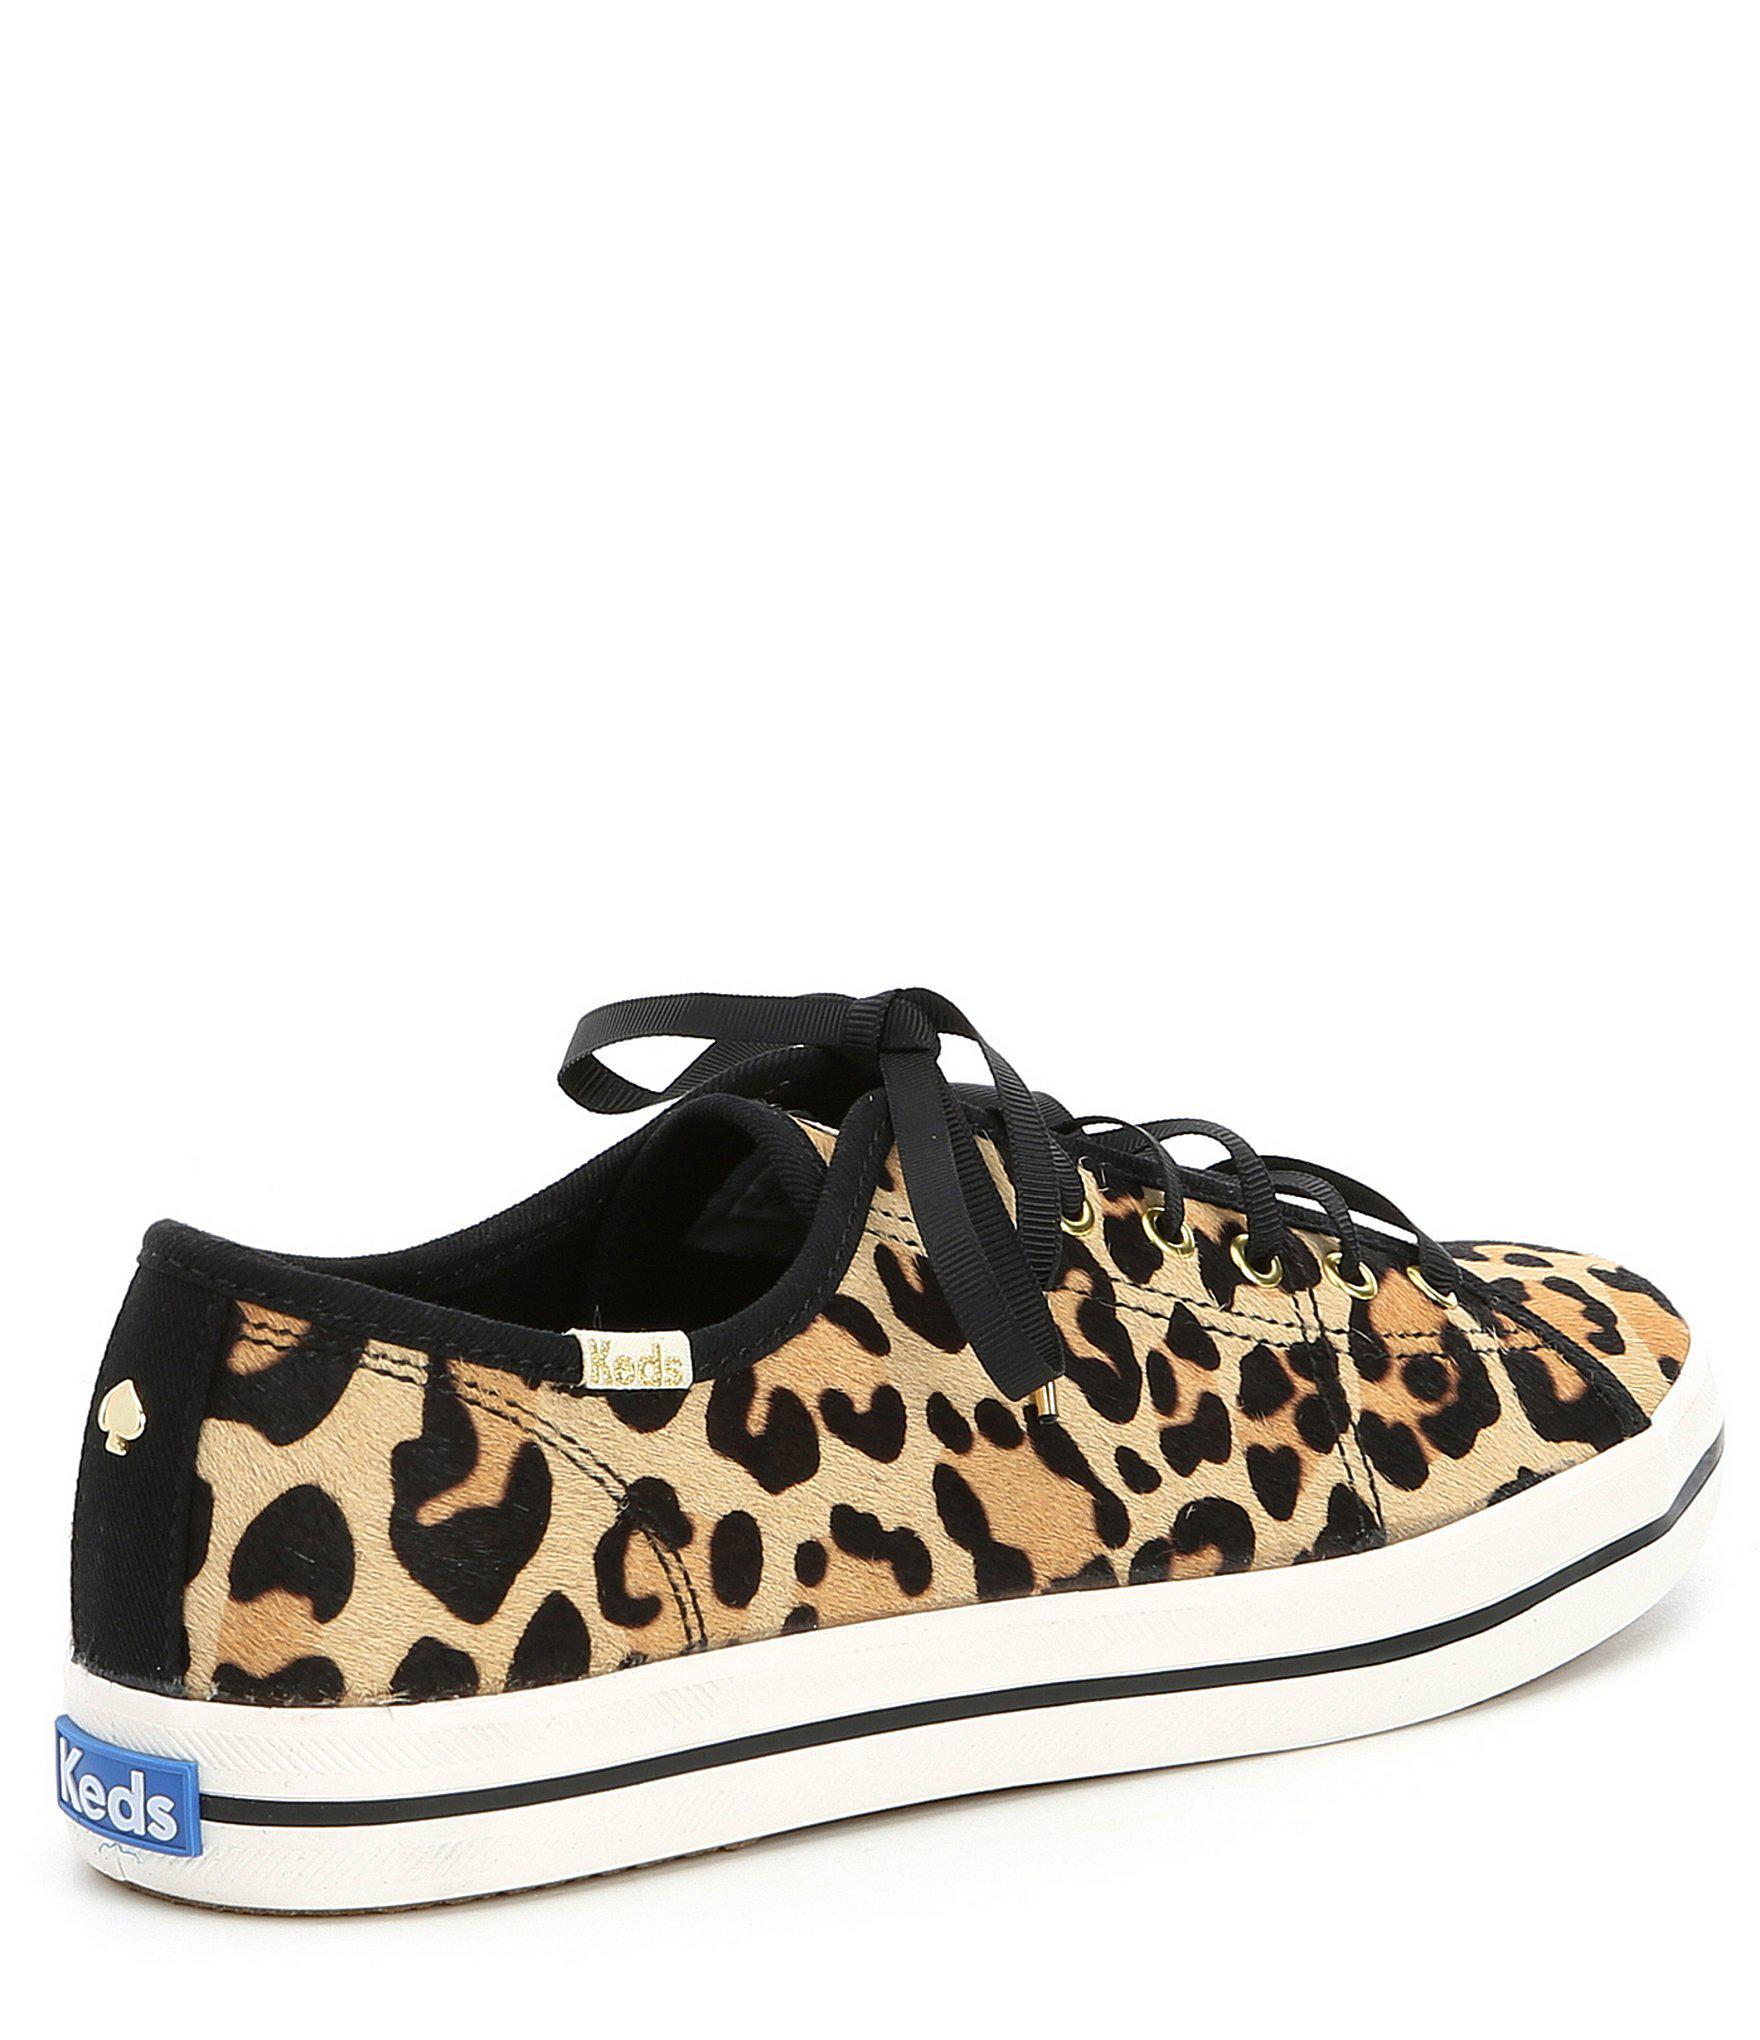 3428eb7dde8c Kate Spade - Brown Keds X Kickstart Leopard Sneakers - Lyst. View fullscreen